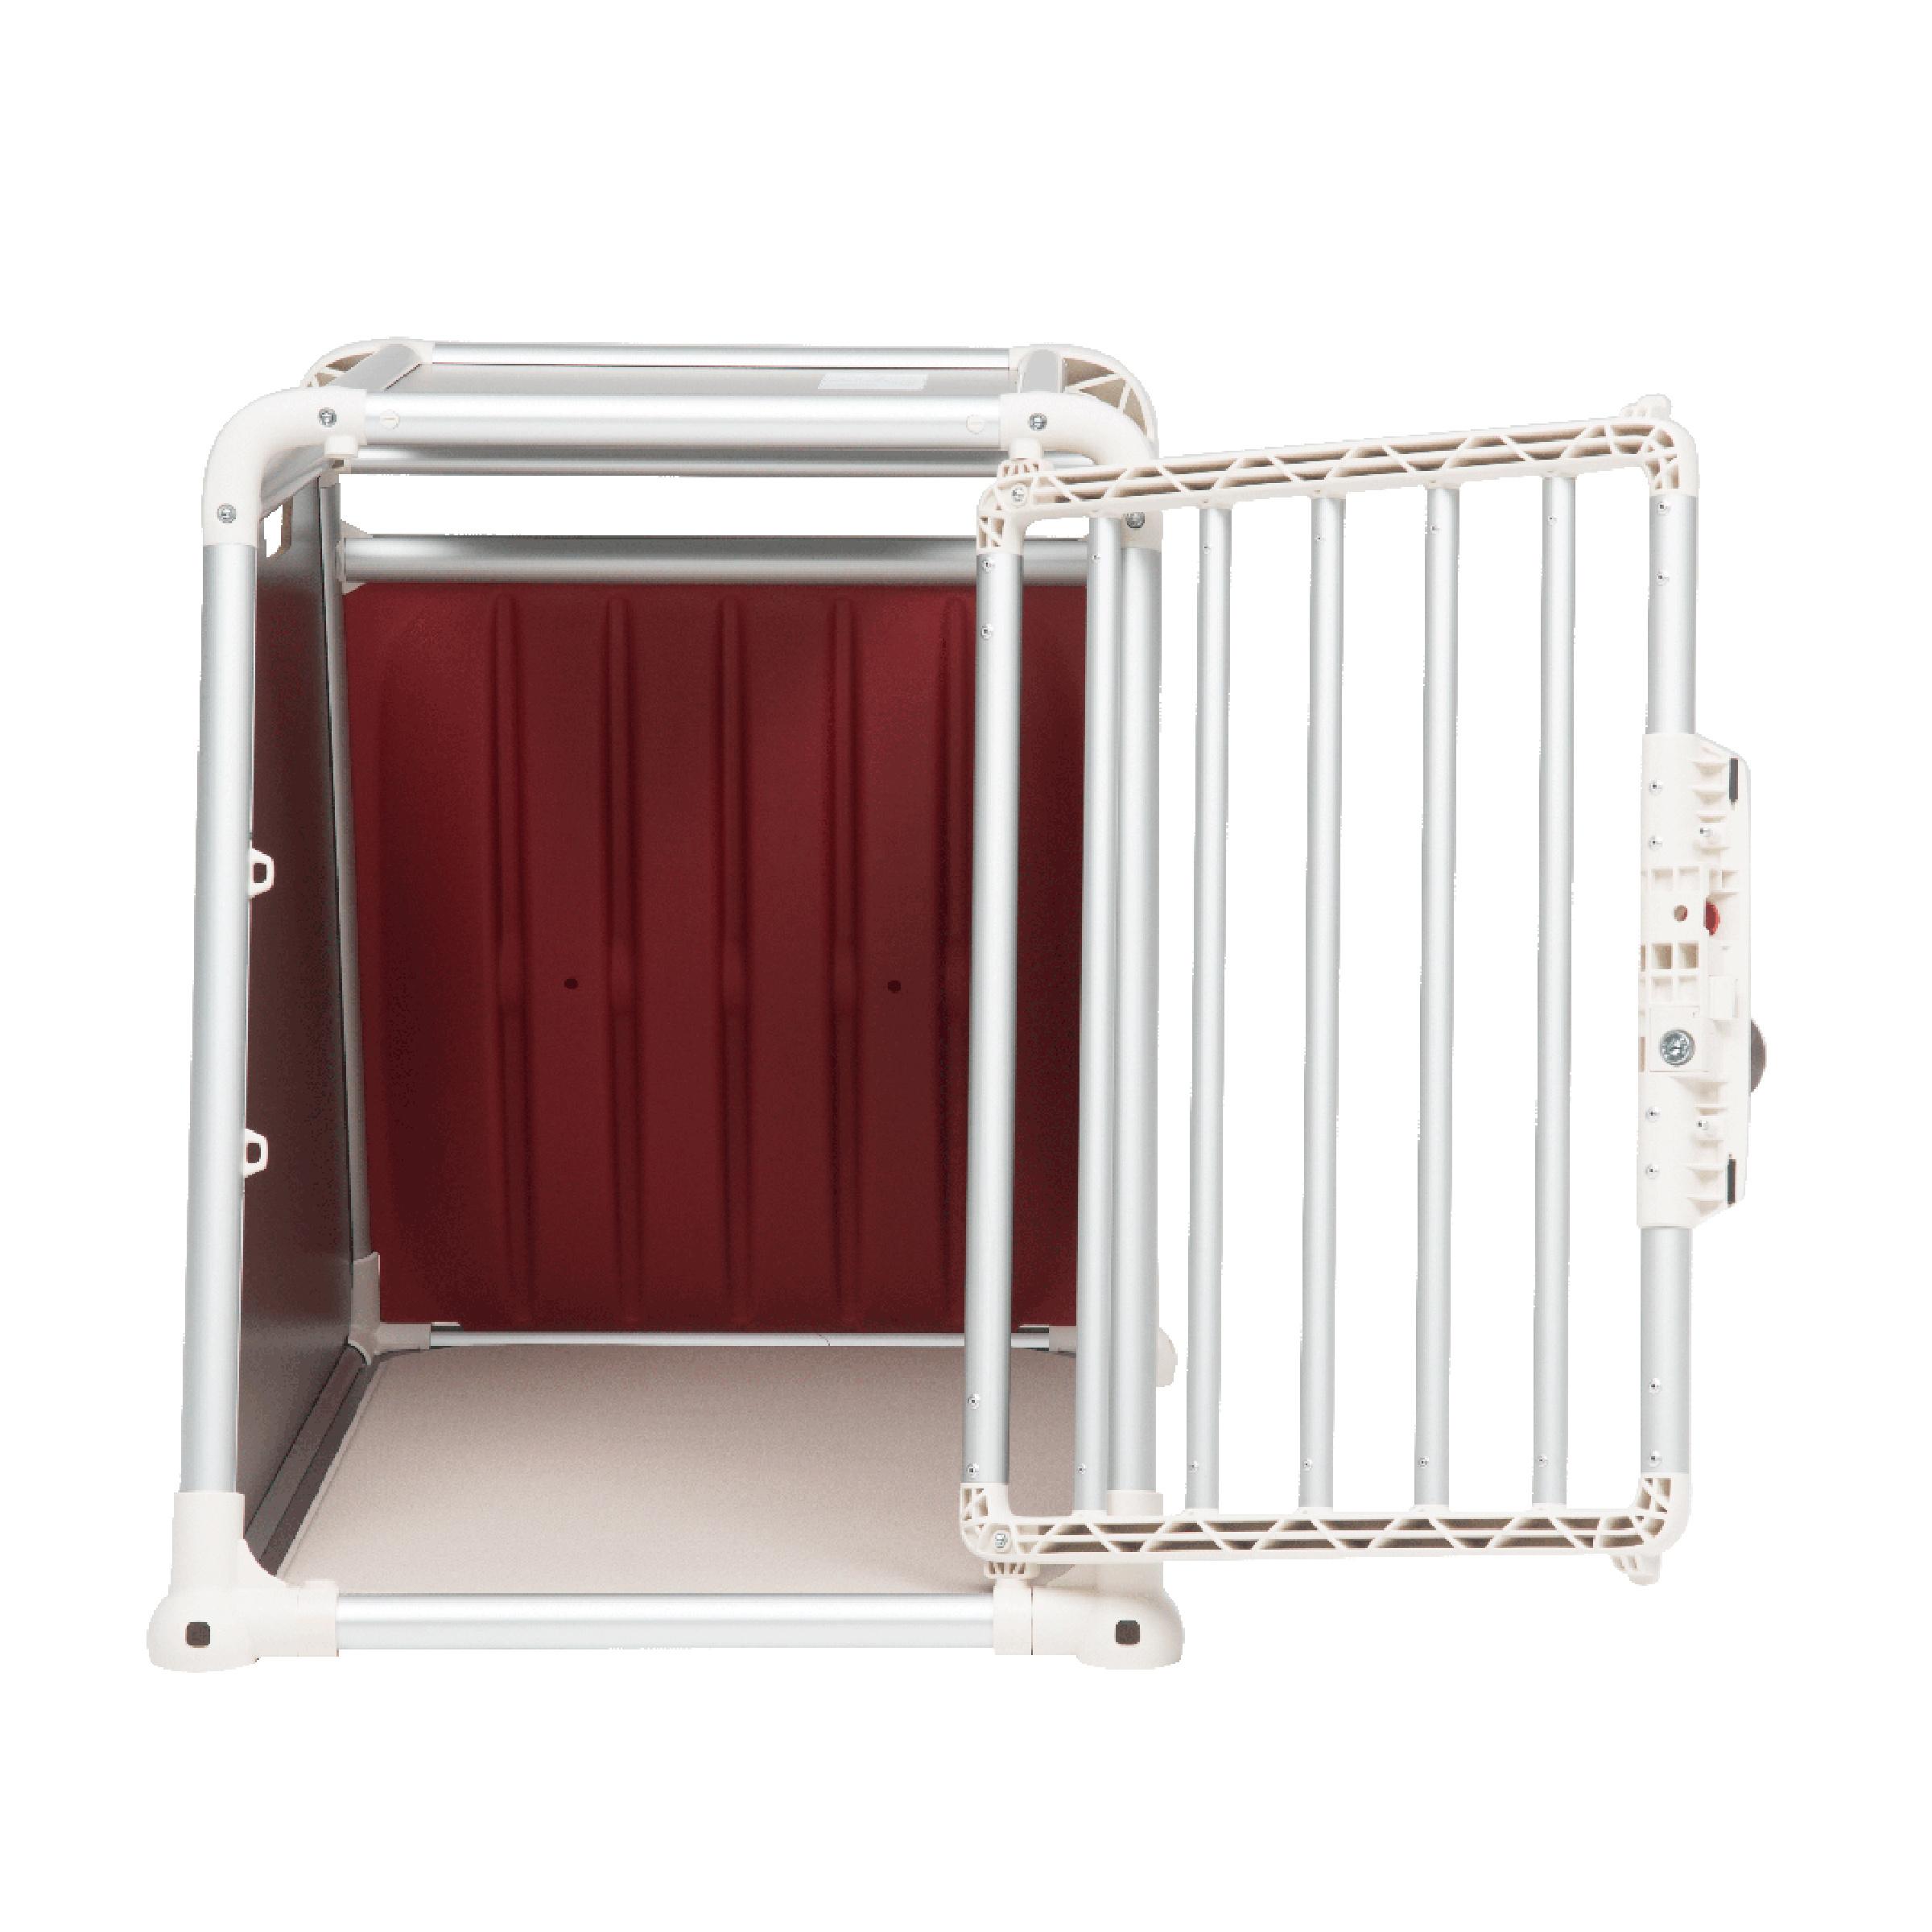 Image of 4pets Autobox ECO 2 Medium 66x54.5x83.5cm